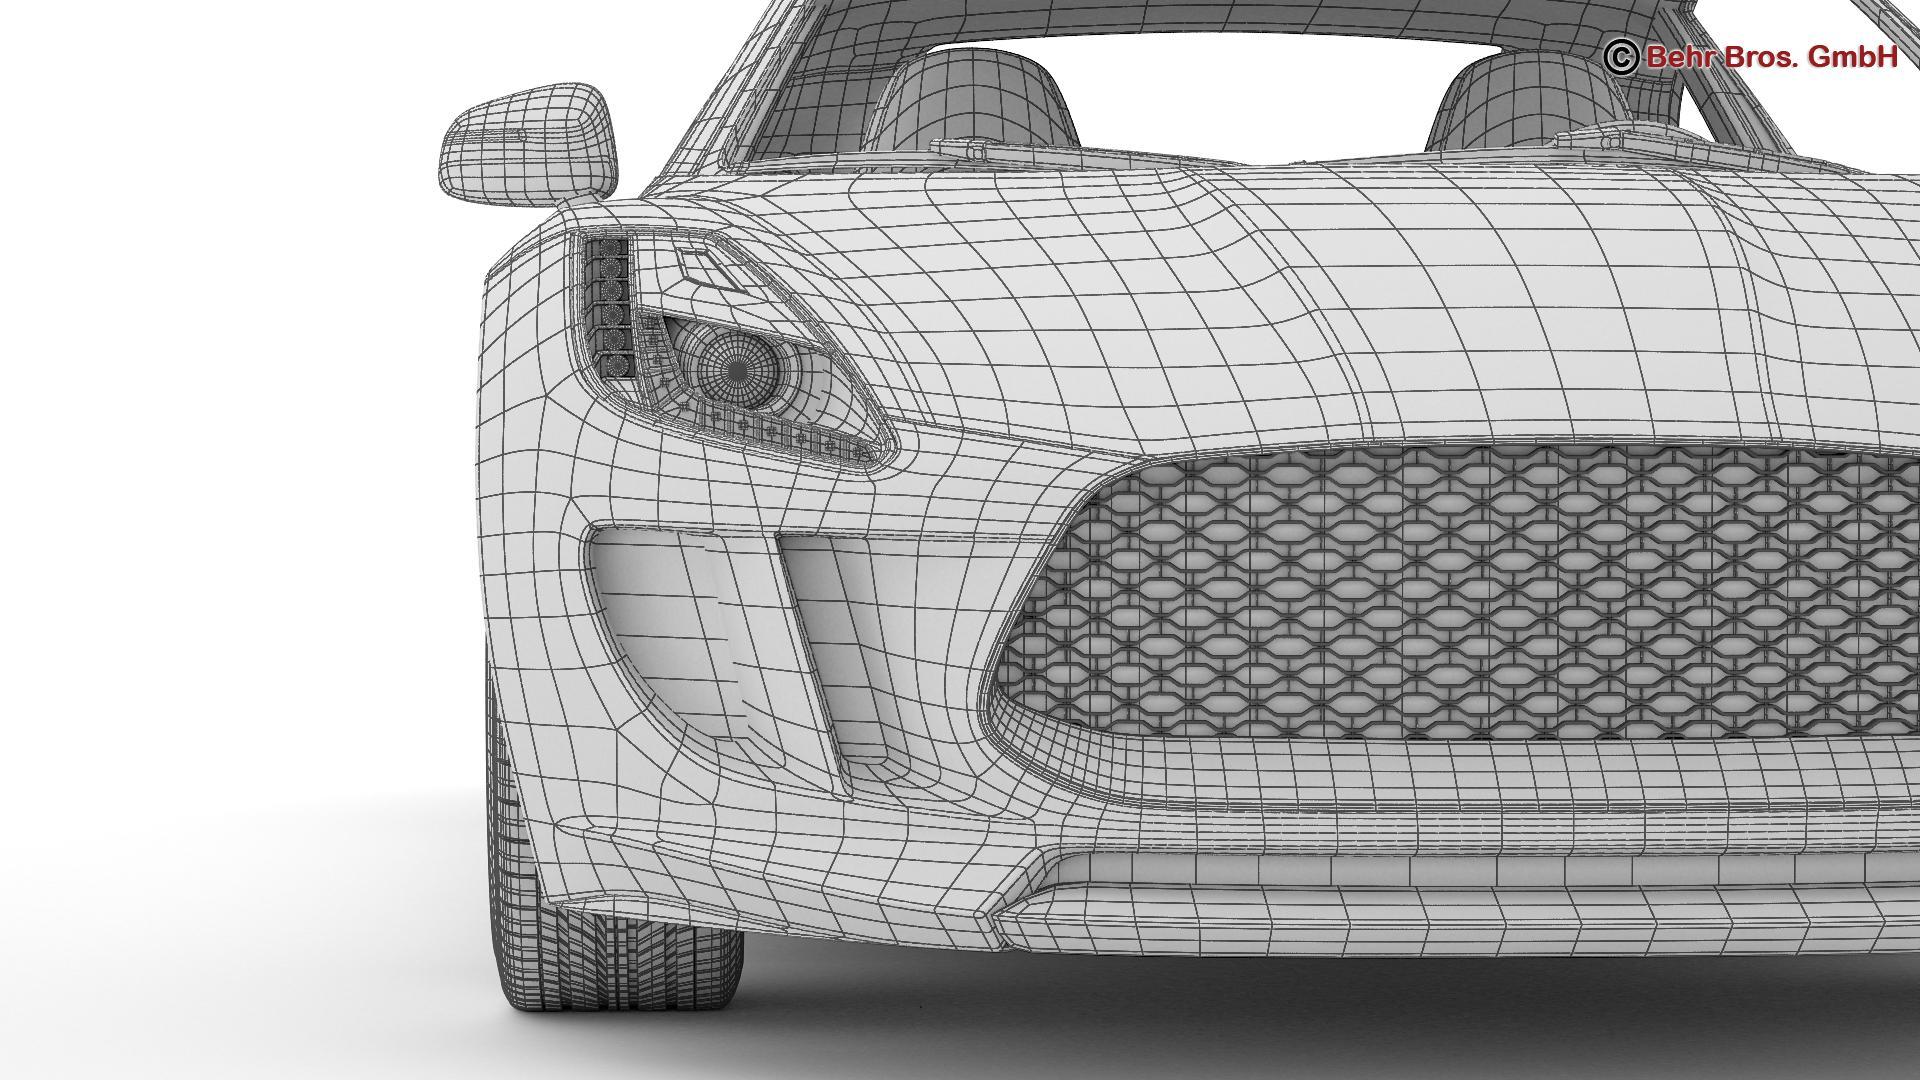 generic sports car 3d model 3ds max fbx c4d lwo ma mb obj 160542